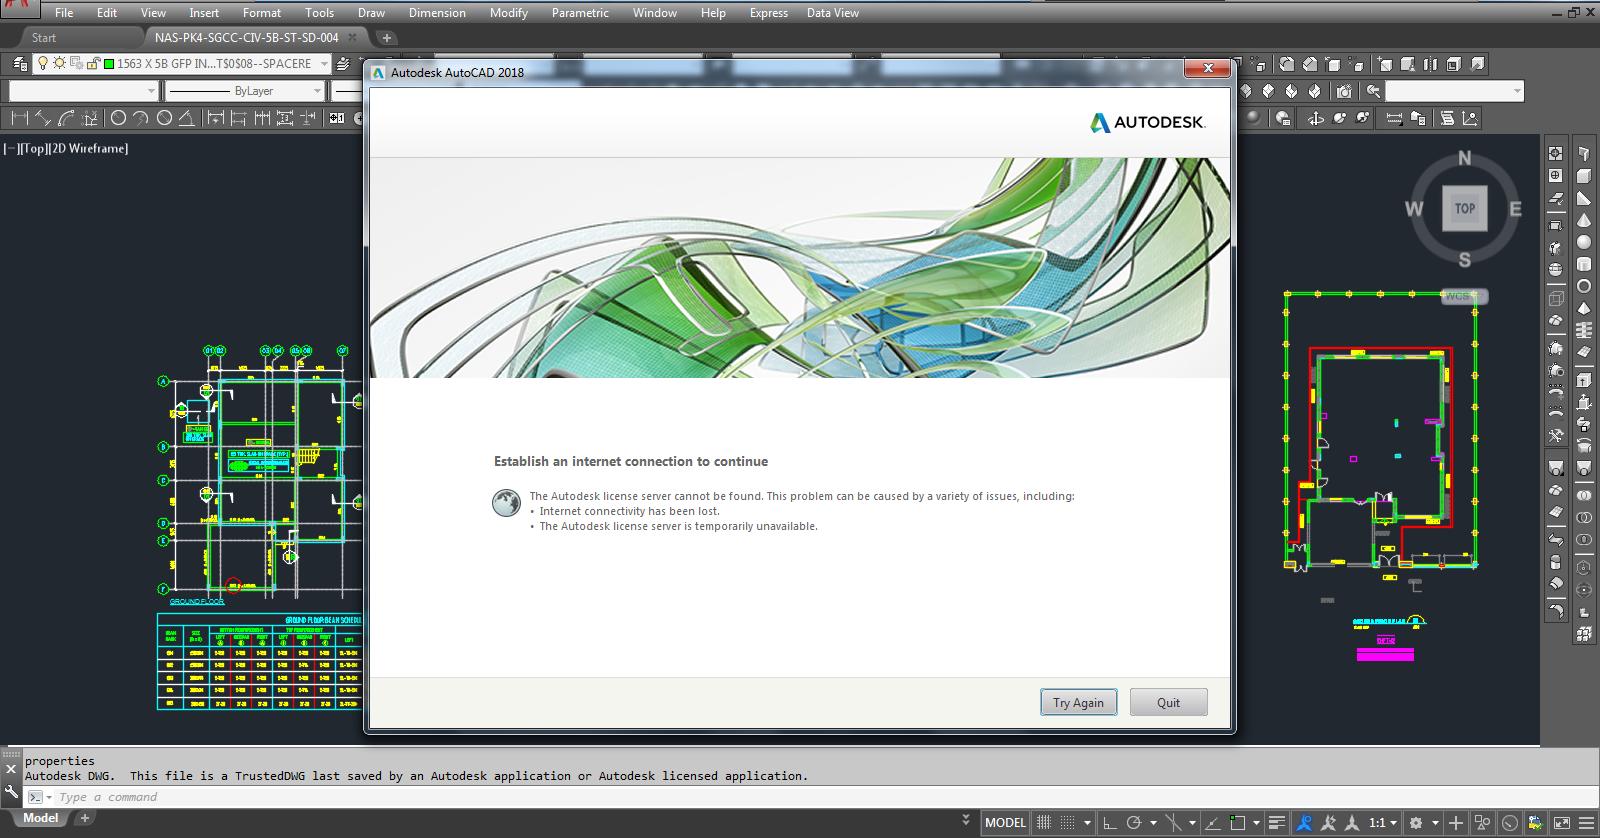 autodesk license server cannot be found - Autodesk Community